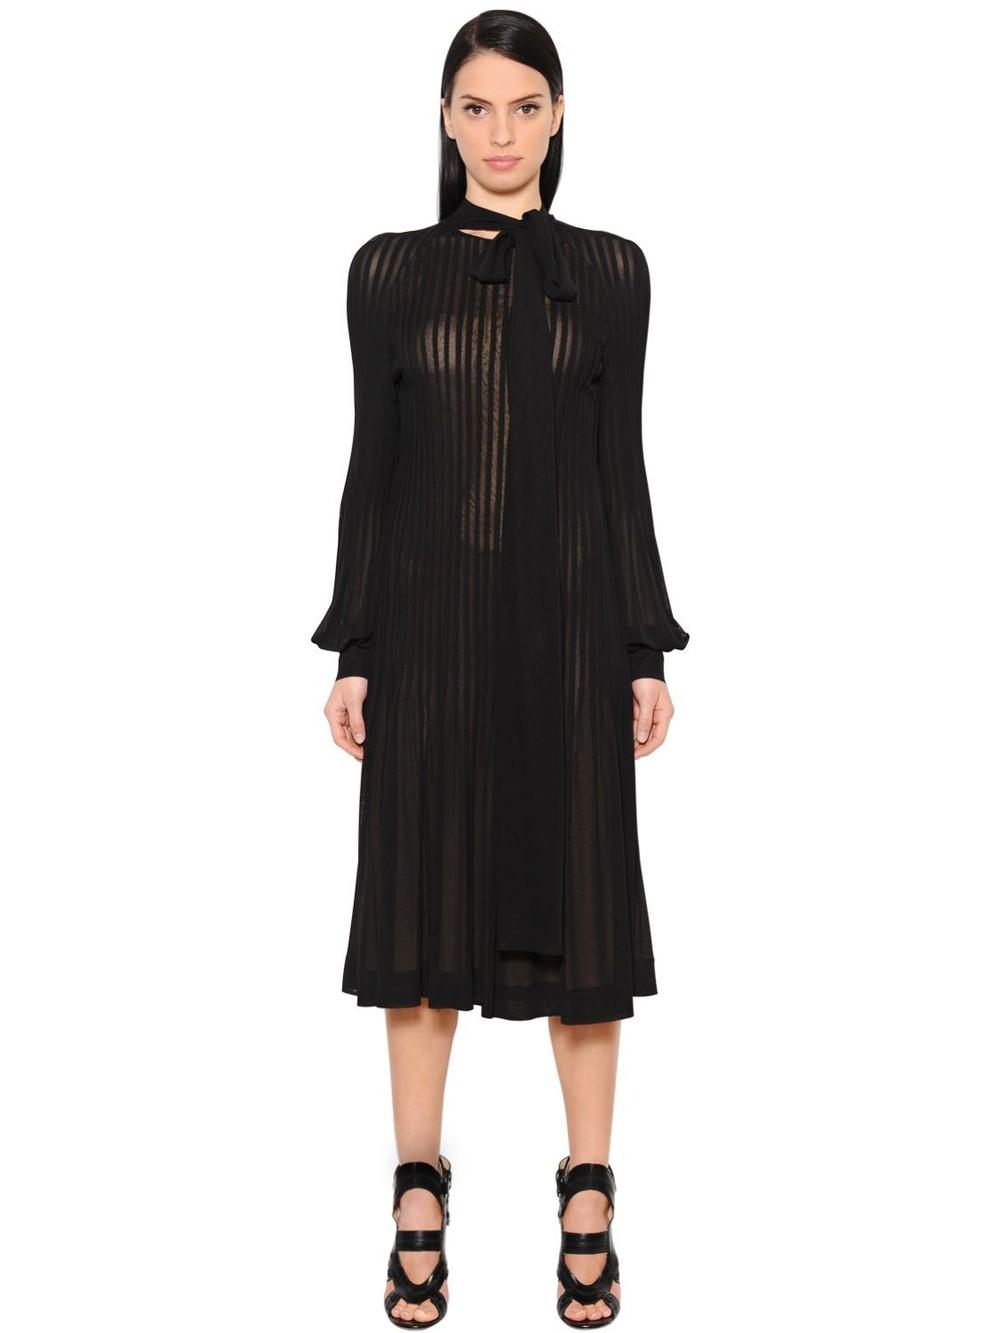 ANTONIO BERARDI Pleated Crepe Jersey Midi Dress in black